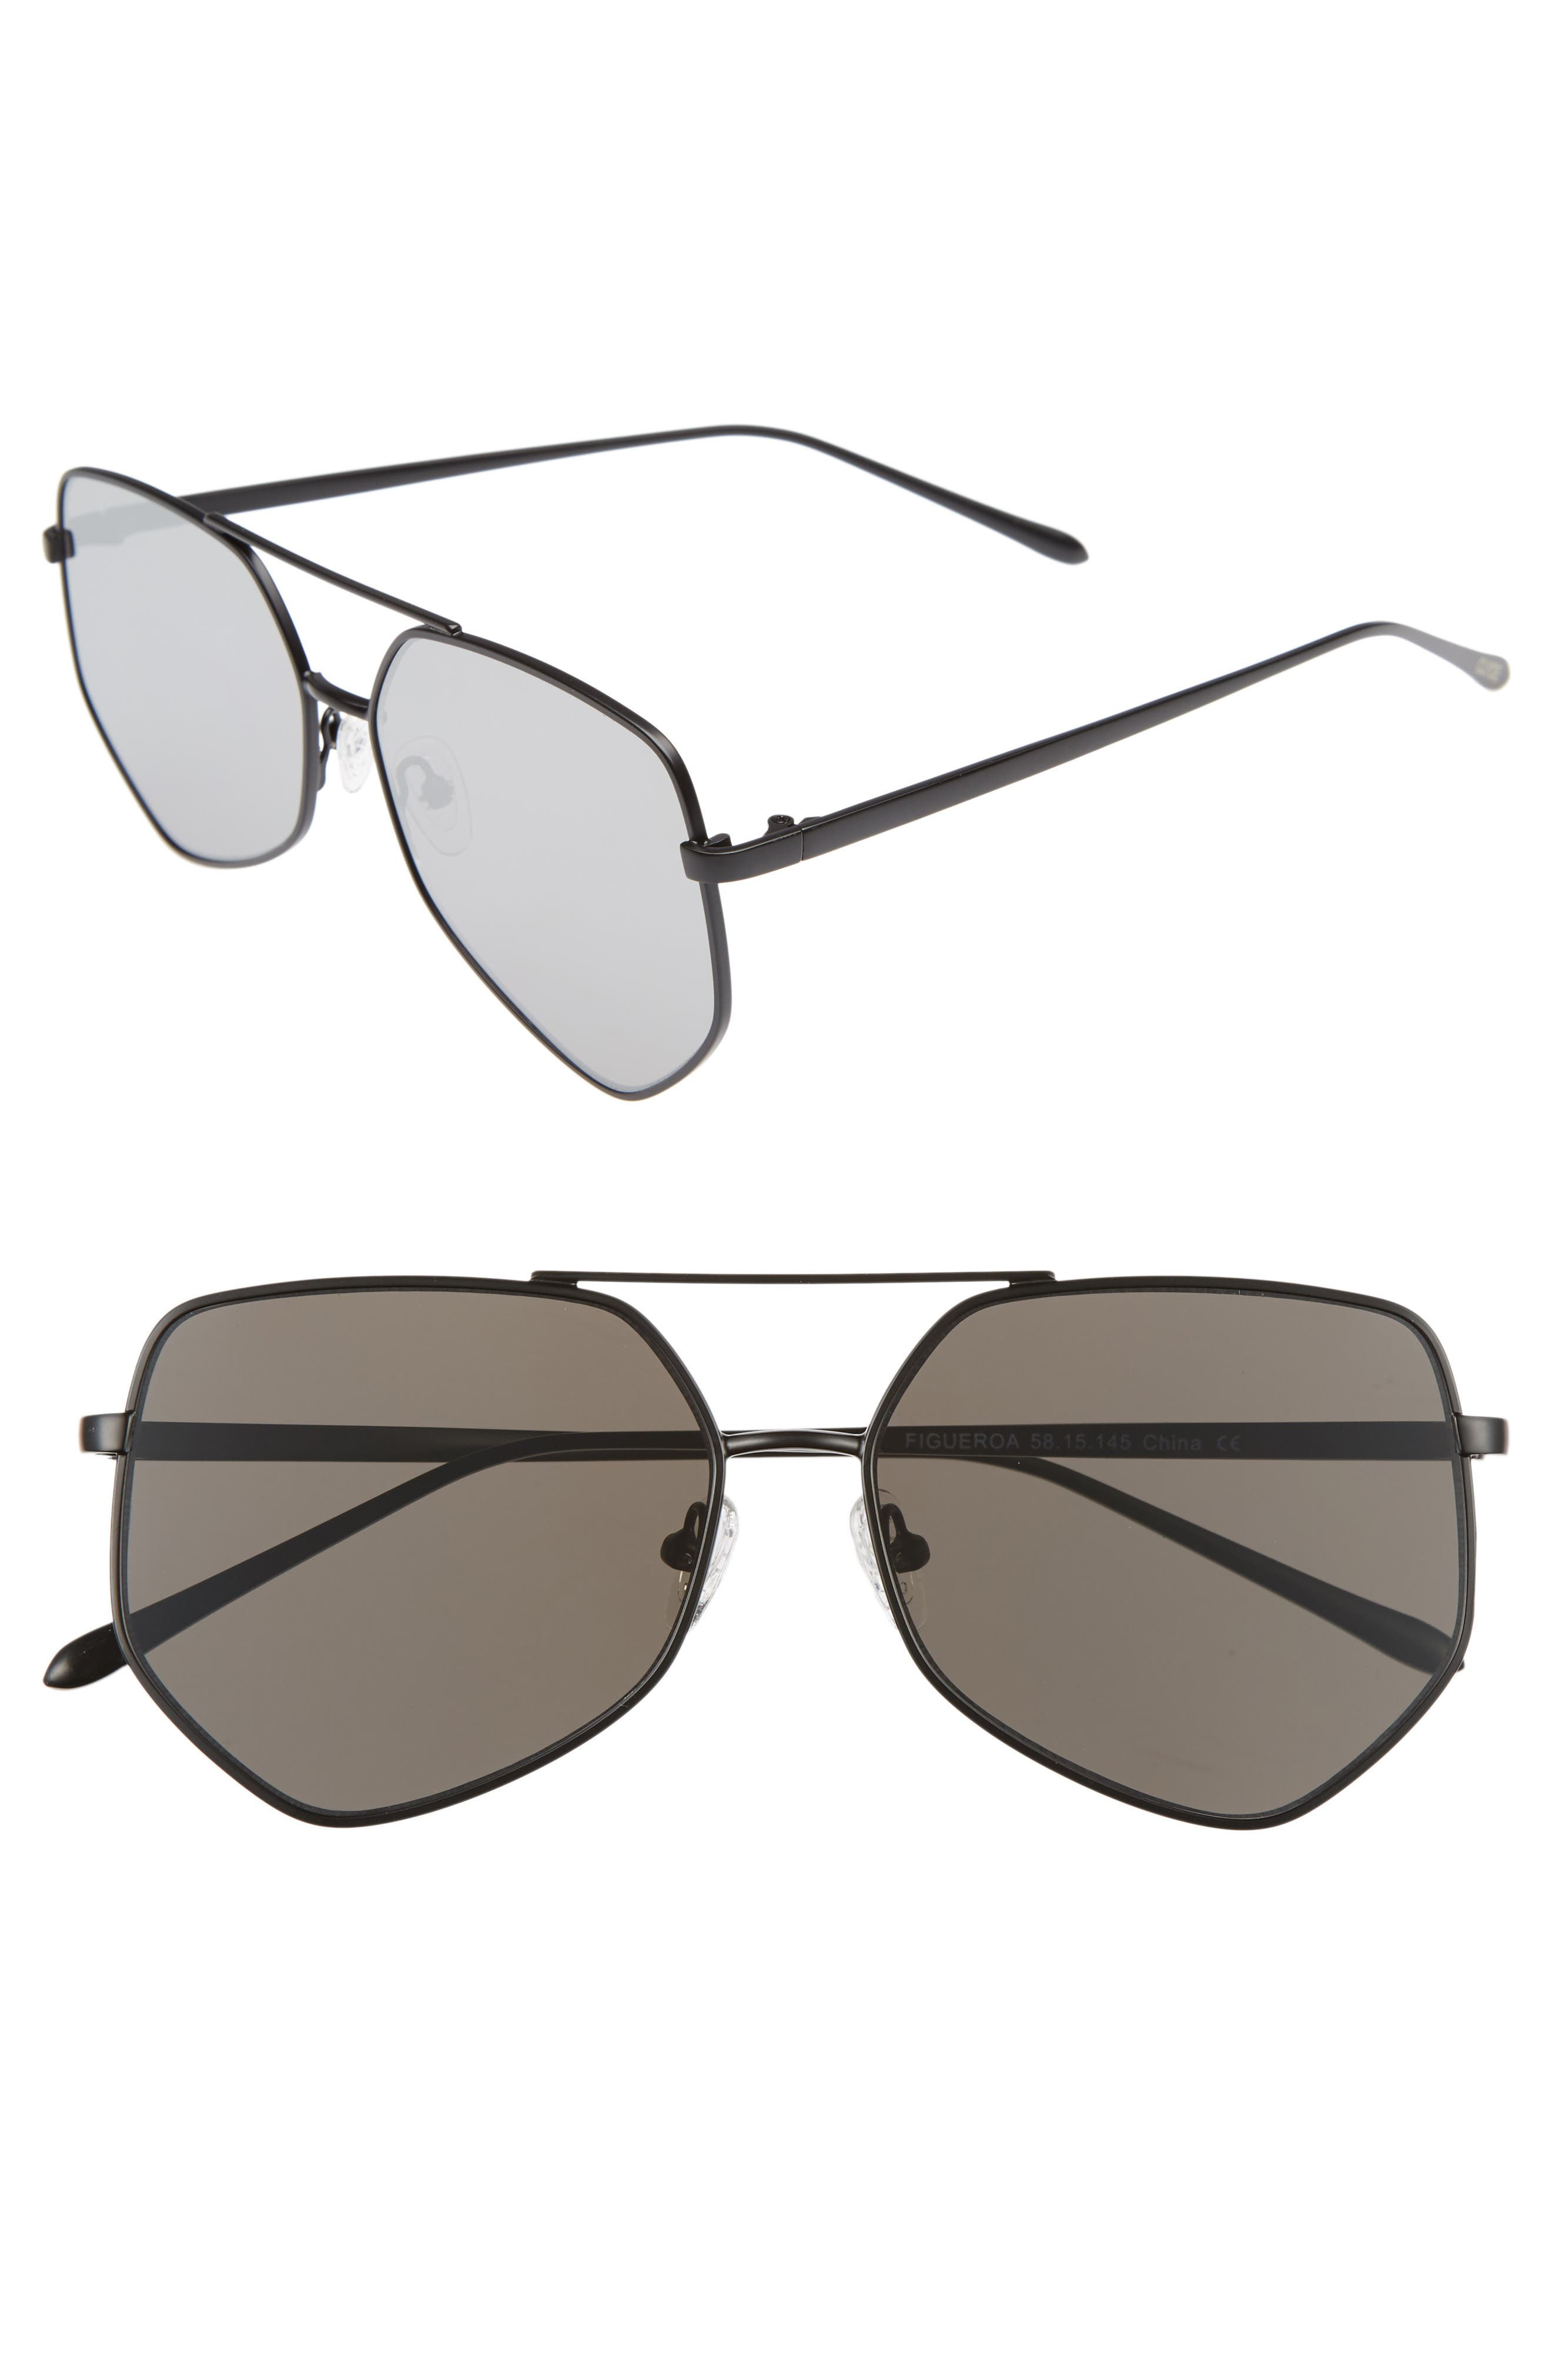 Figueroa 58mm Sunglasses,                             Main thumbnail 1, color,                             GRAVITY BLACK